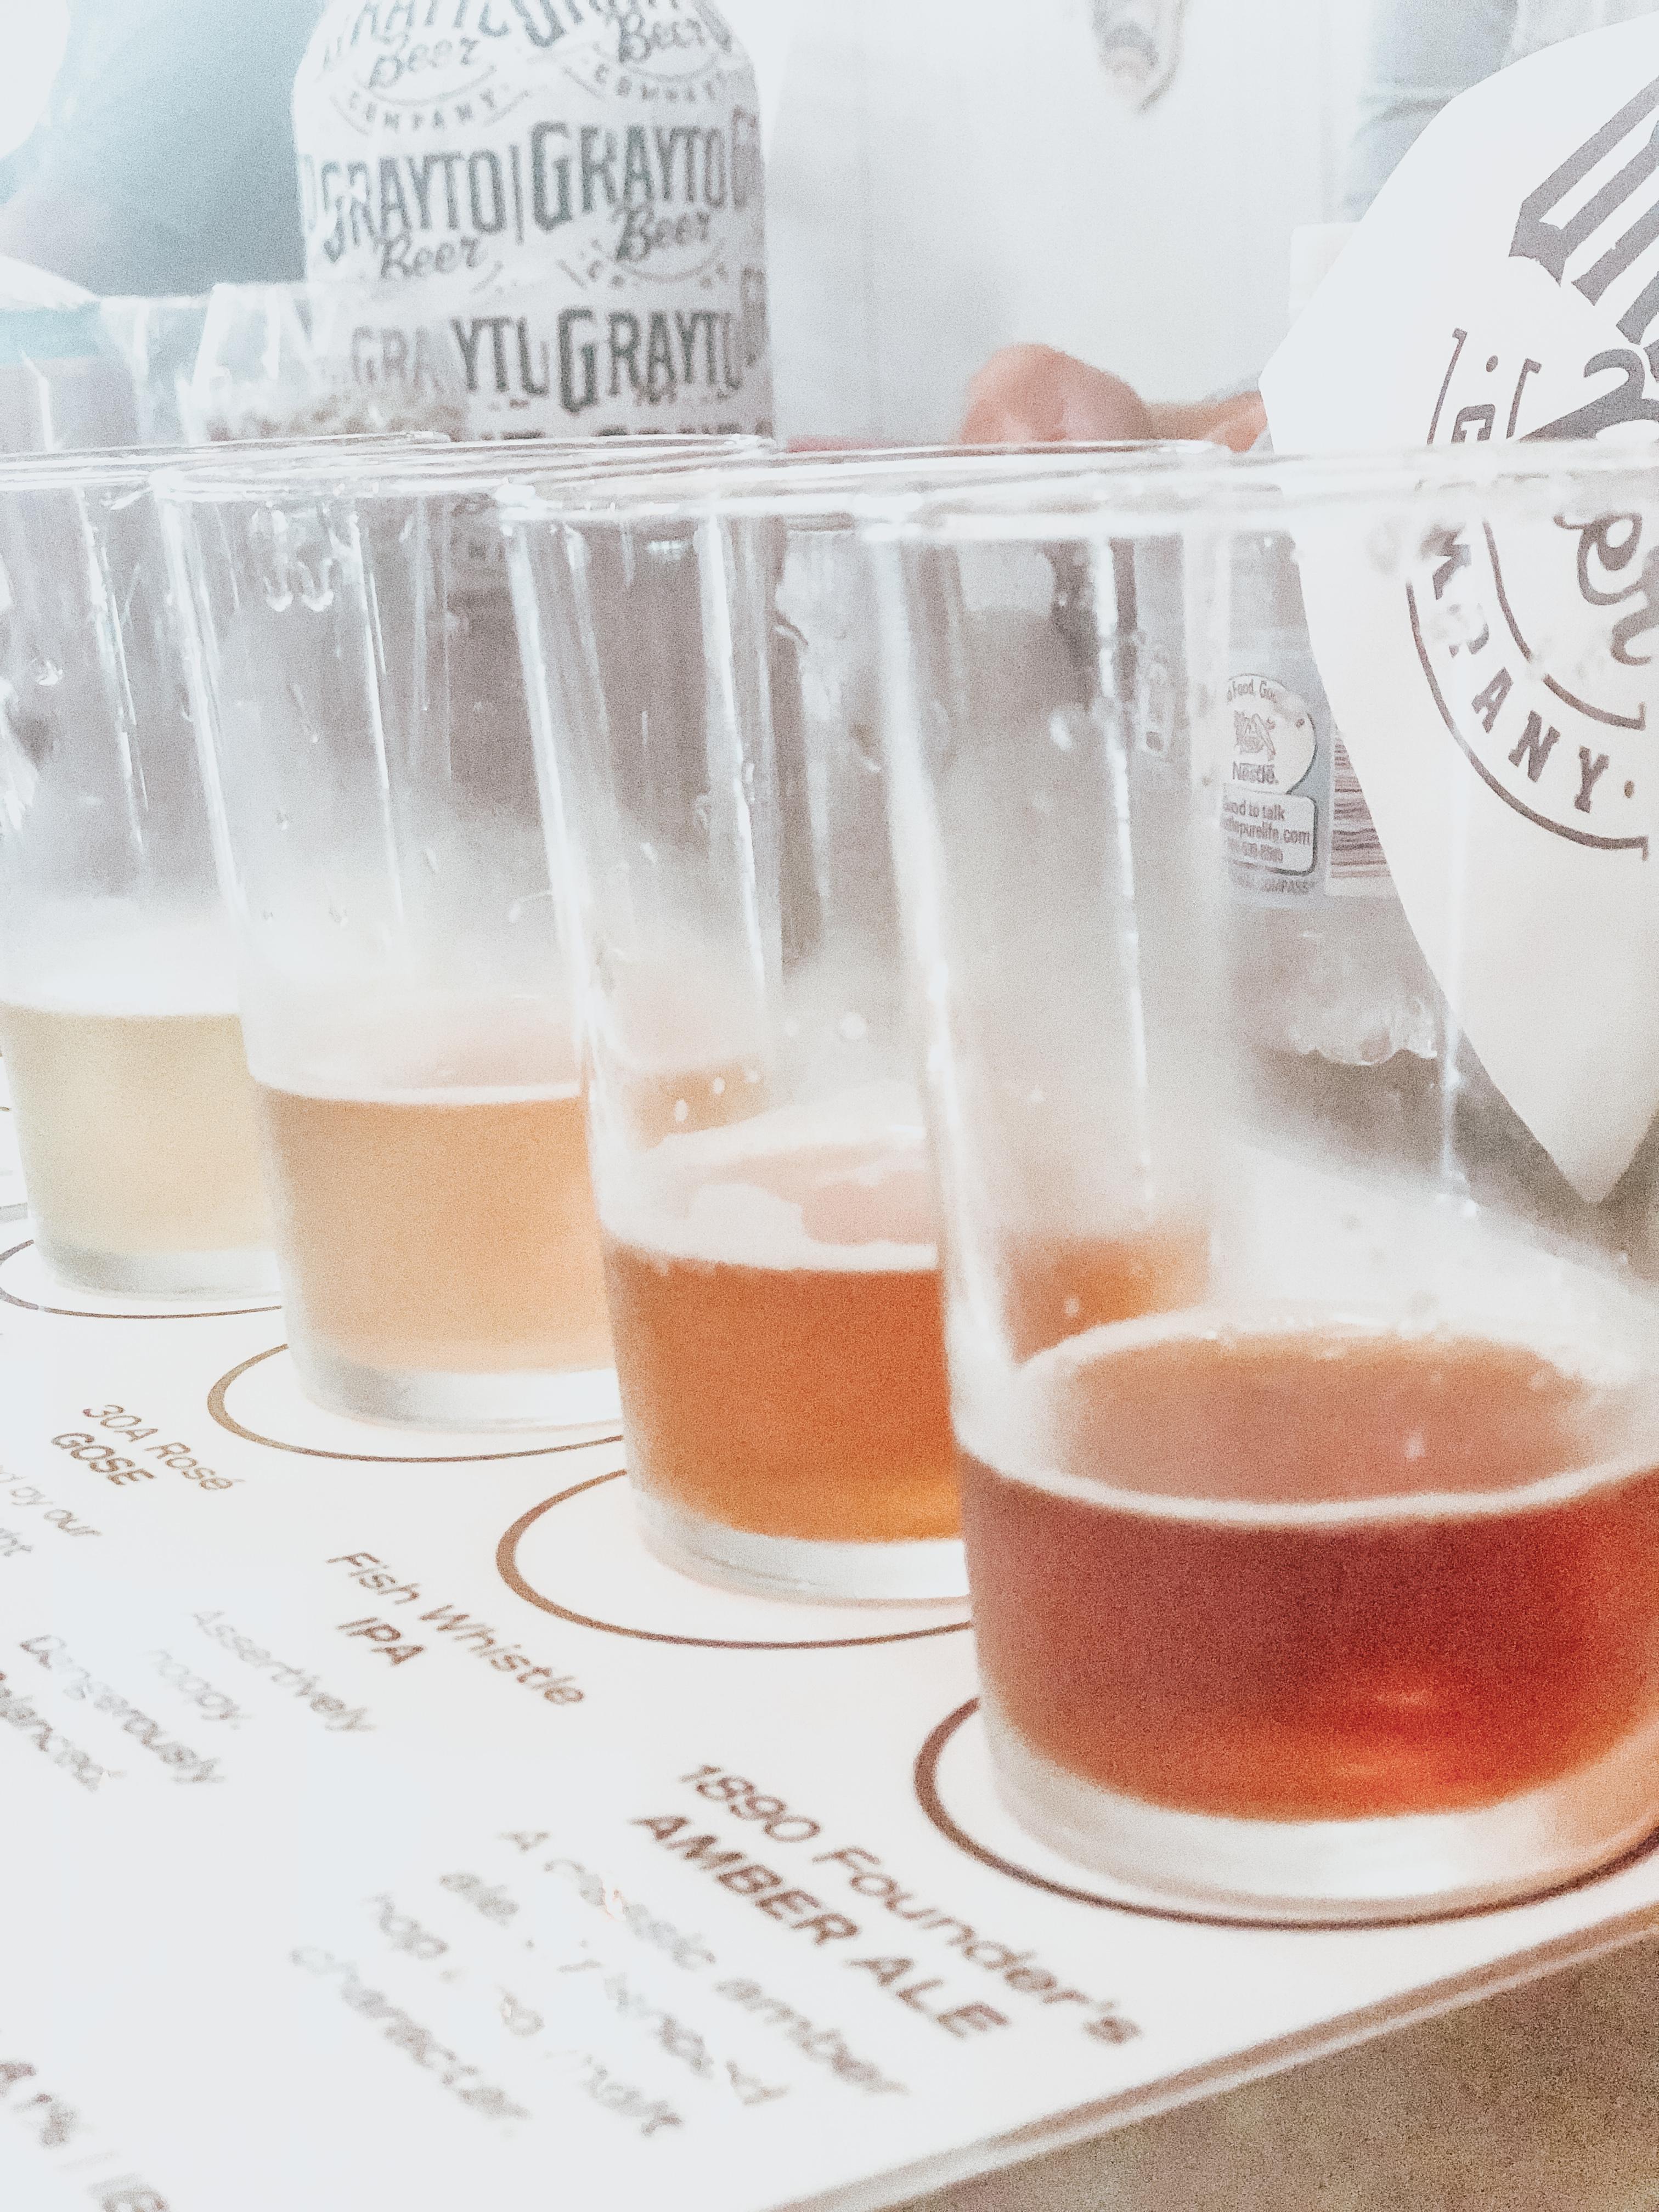 30A Blogger Weekend - Grayton Beer Tasting